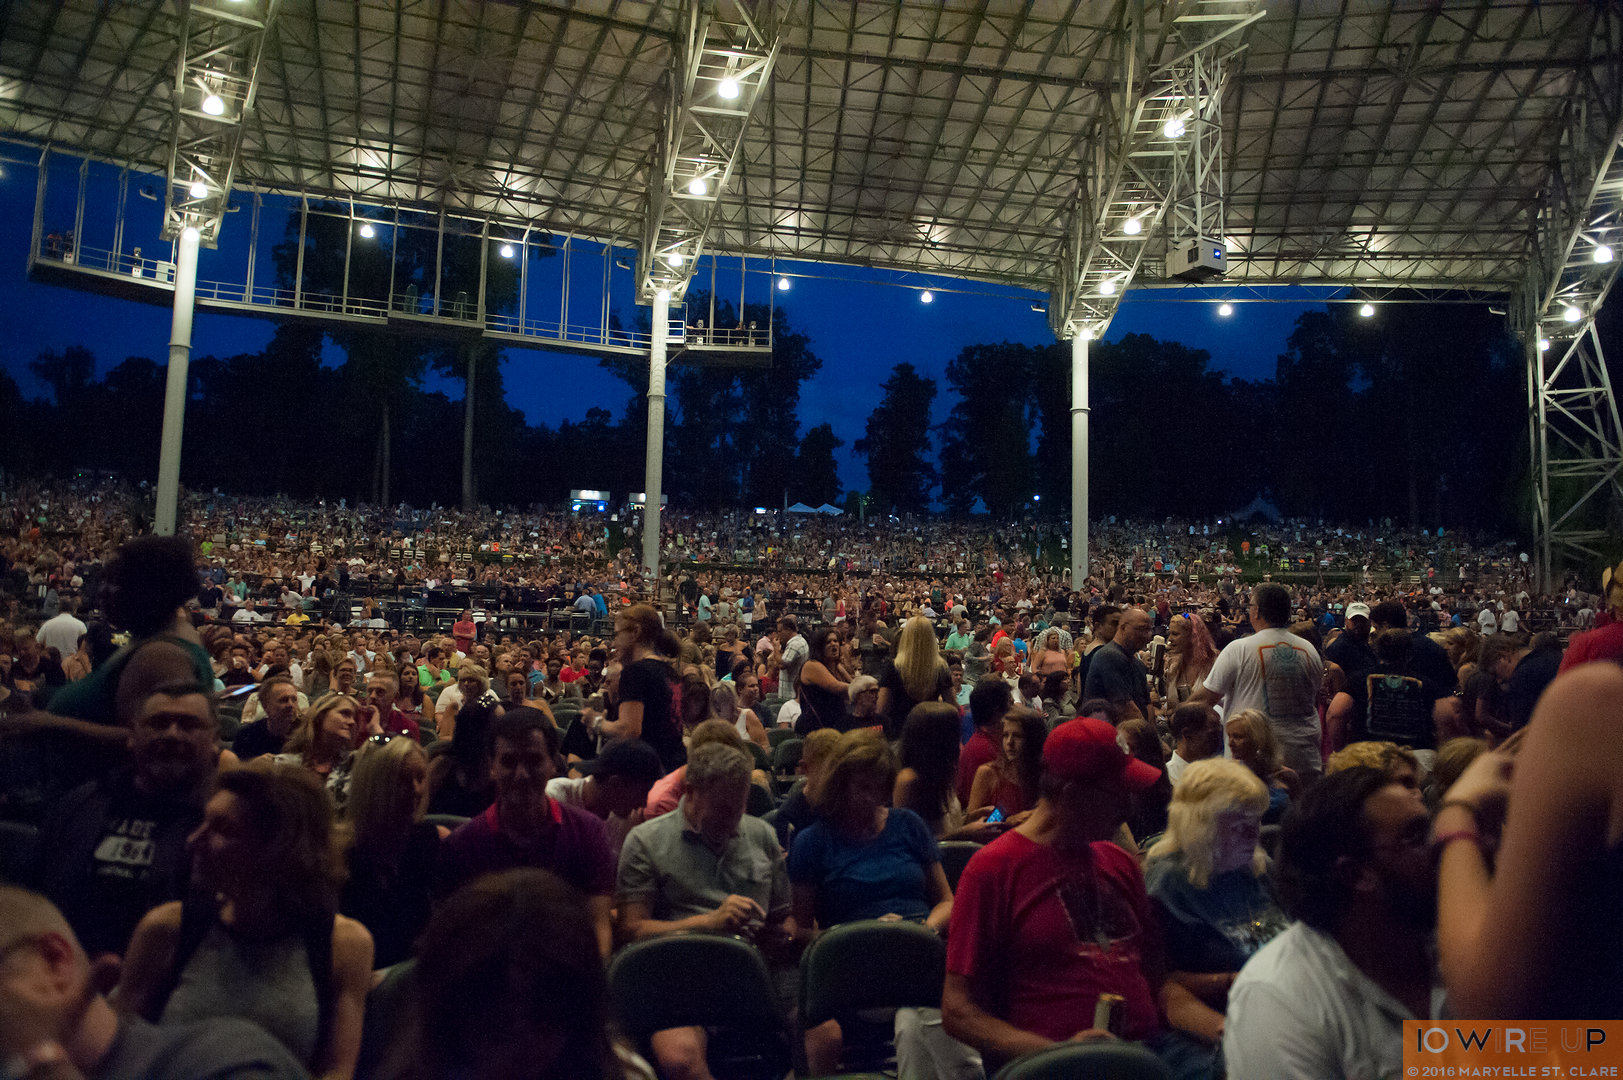 Train. Verizon Wireless Amphitheatre, Atlanta (Alpharetta) GA. 13 Aug 2016.